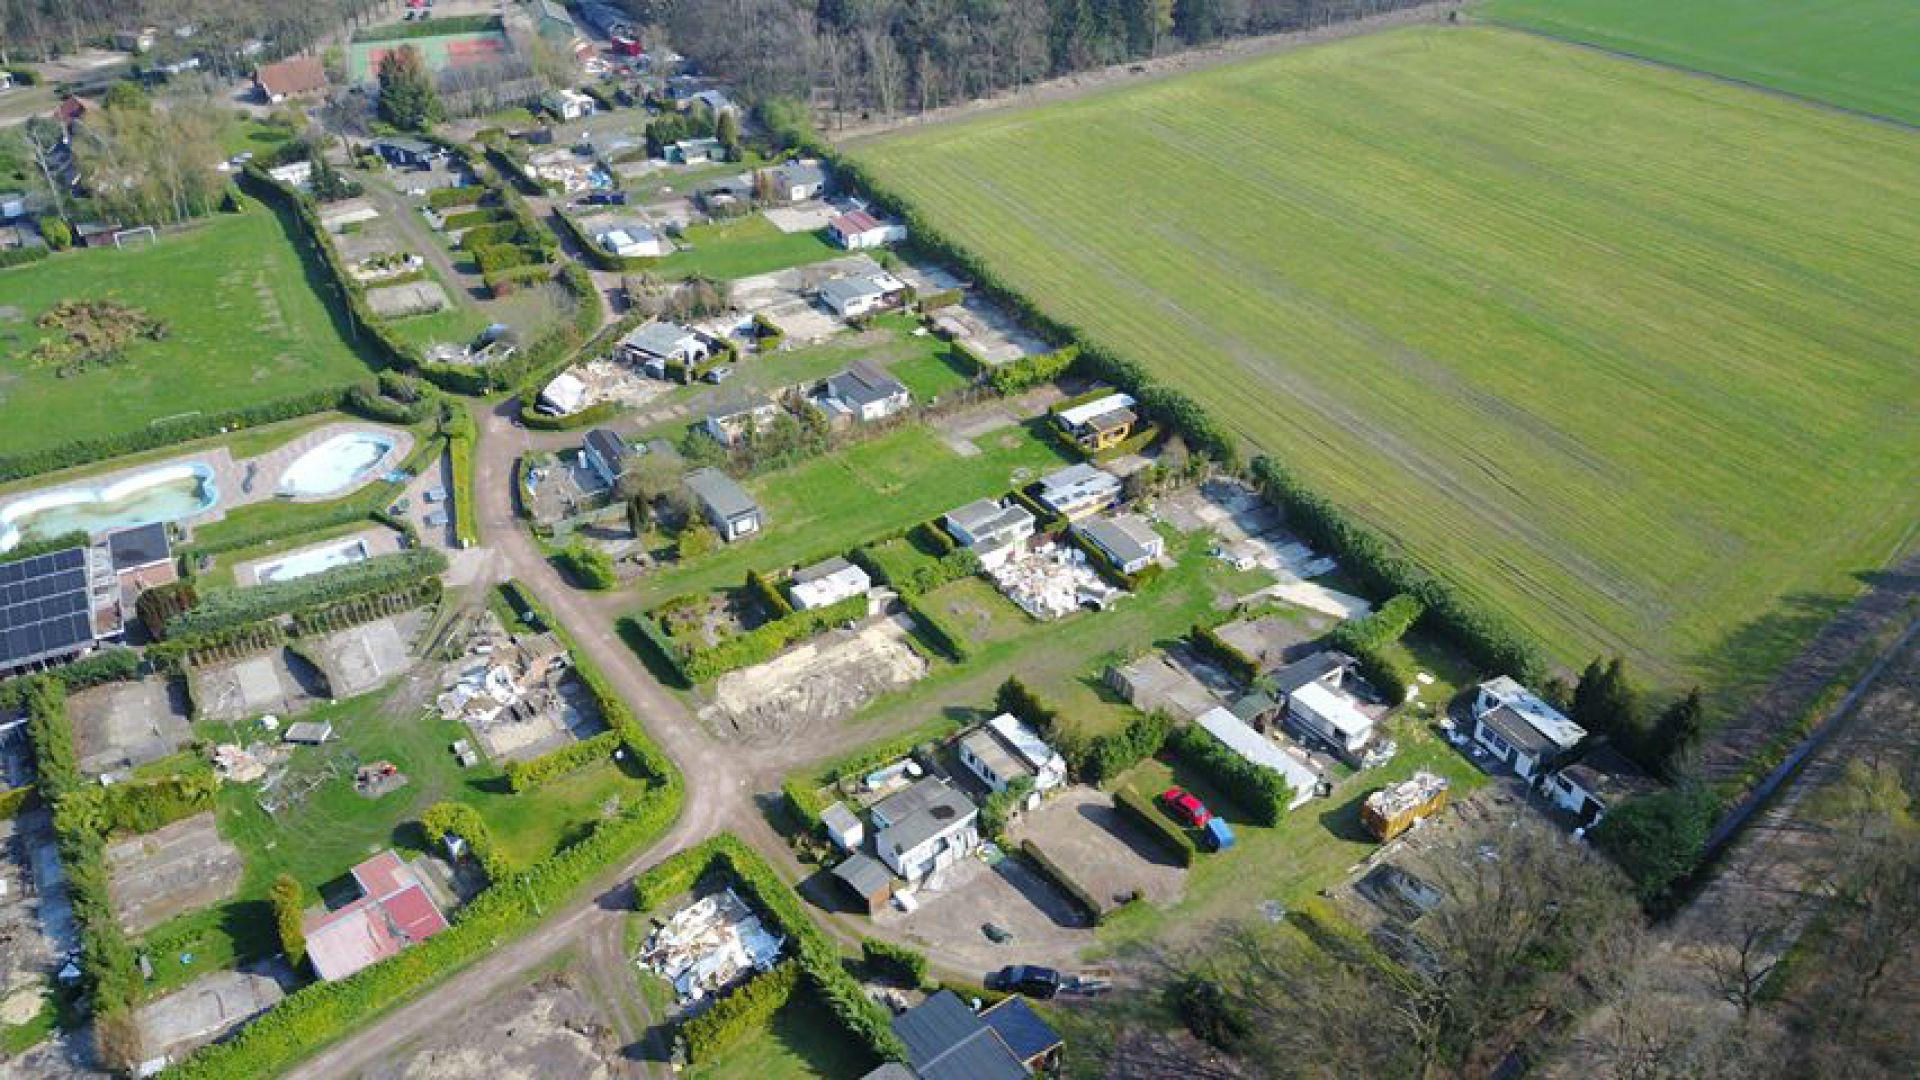 'Innen belasting Westerholt haaks op 'toeristenvriendelijkheid' gemeente'